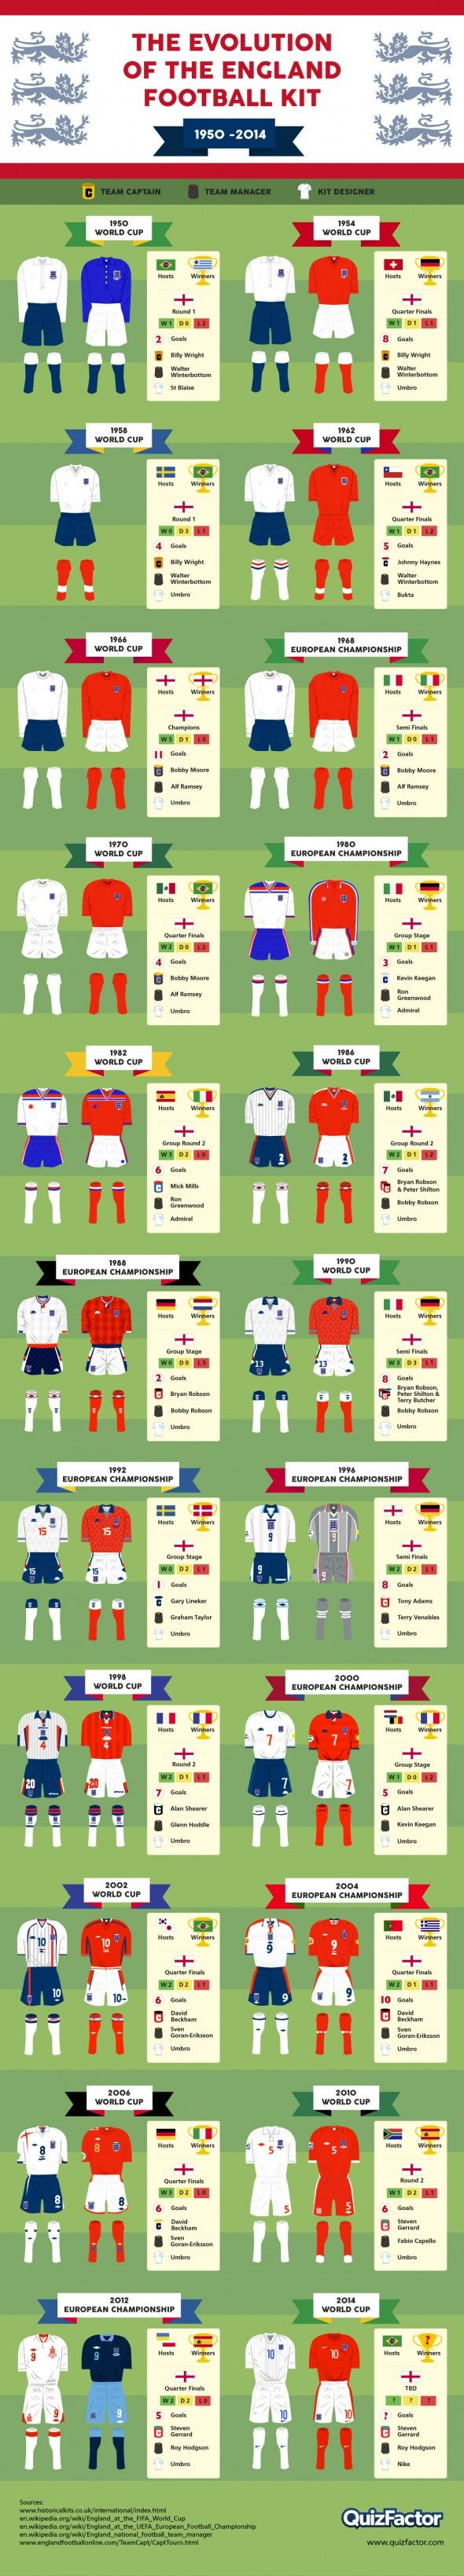 Infographic: Evolution Of The England Football Kit